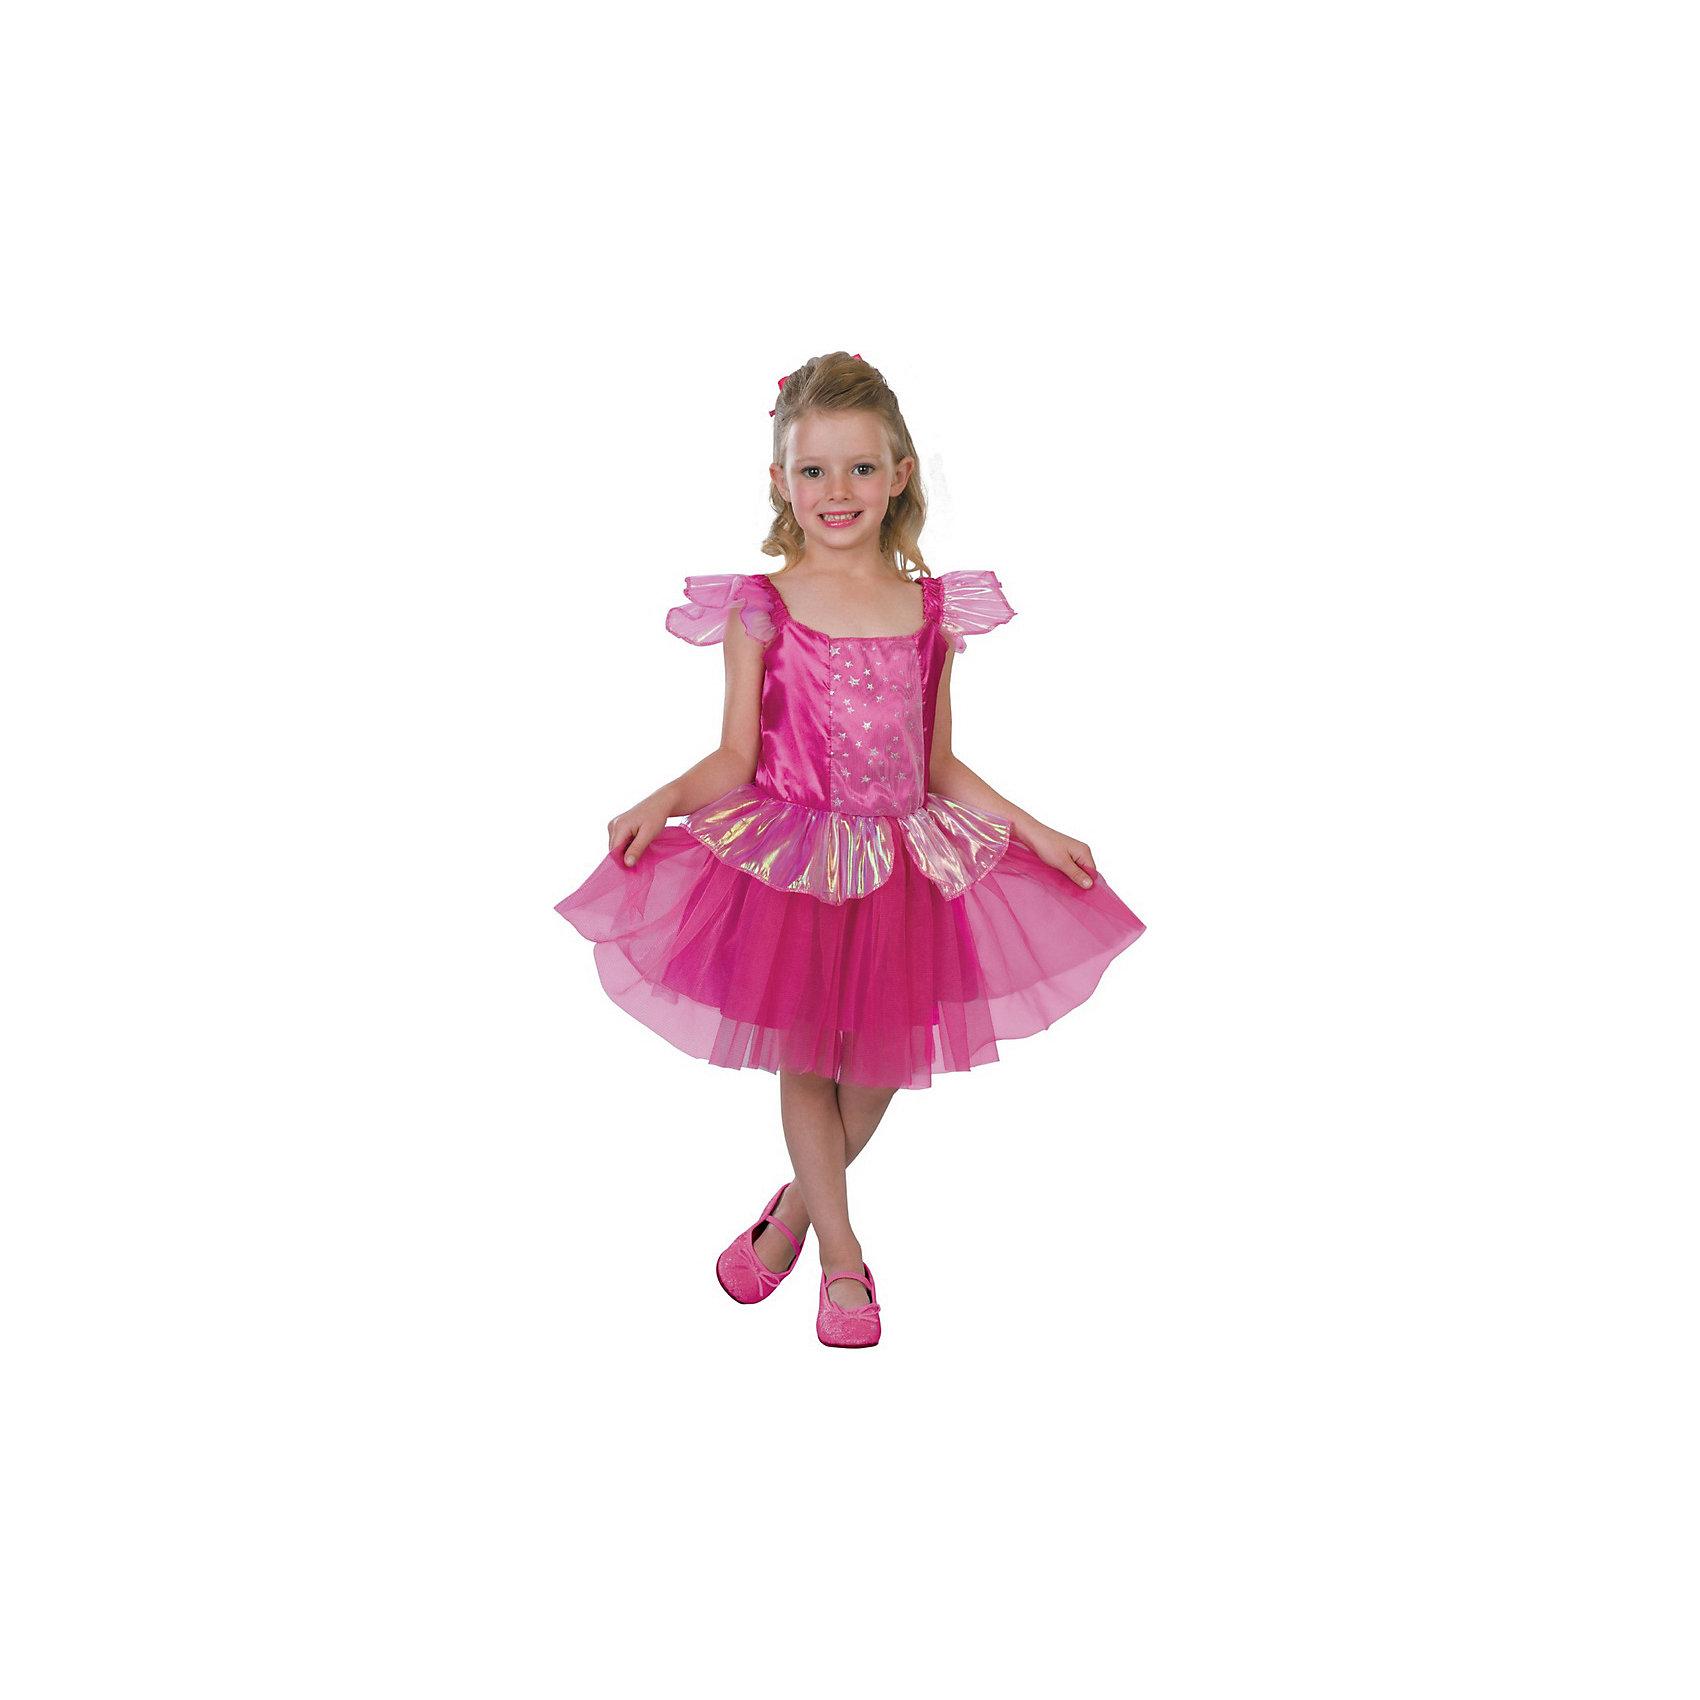 Magic Time Маскарадный костюм для девочки Добрая фея, 6-8  лет 19pcs lot motor hepa filter for dyson dc05 dc08 dc14 dc15 dc21 dc19 dc20 dc29 allergy vacuum cleaner accessory parts replacement